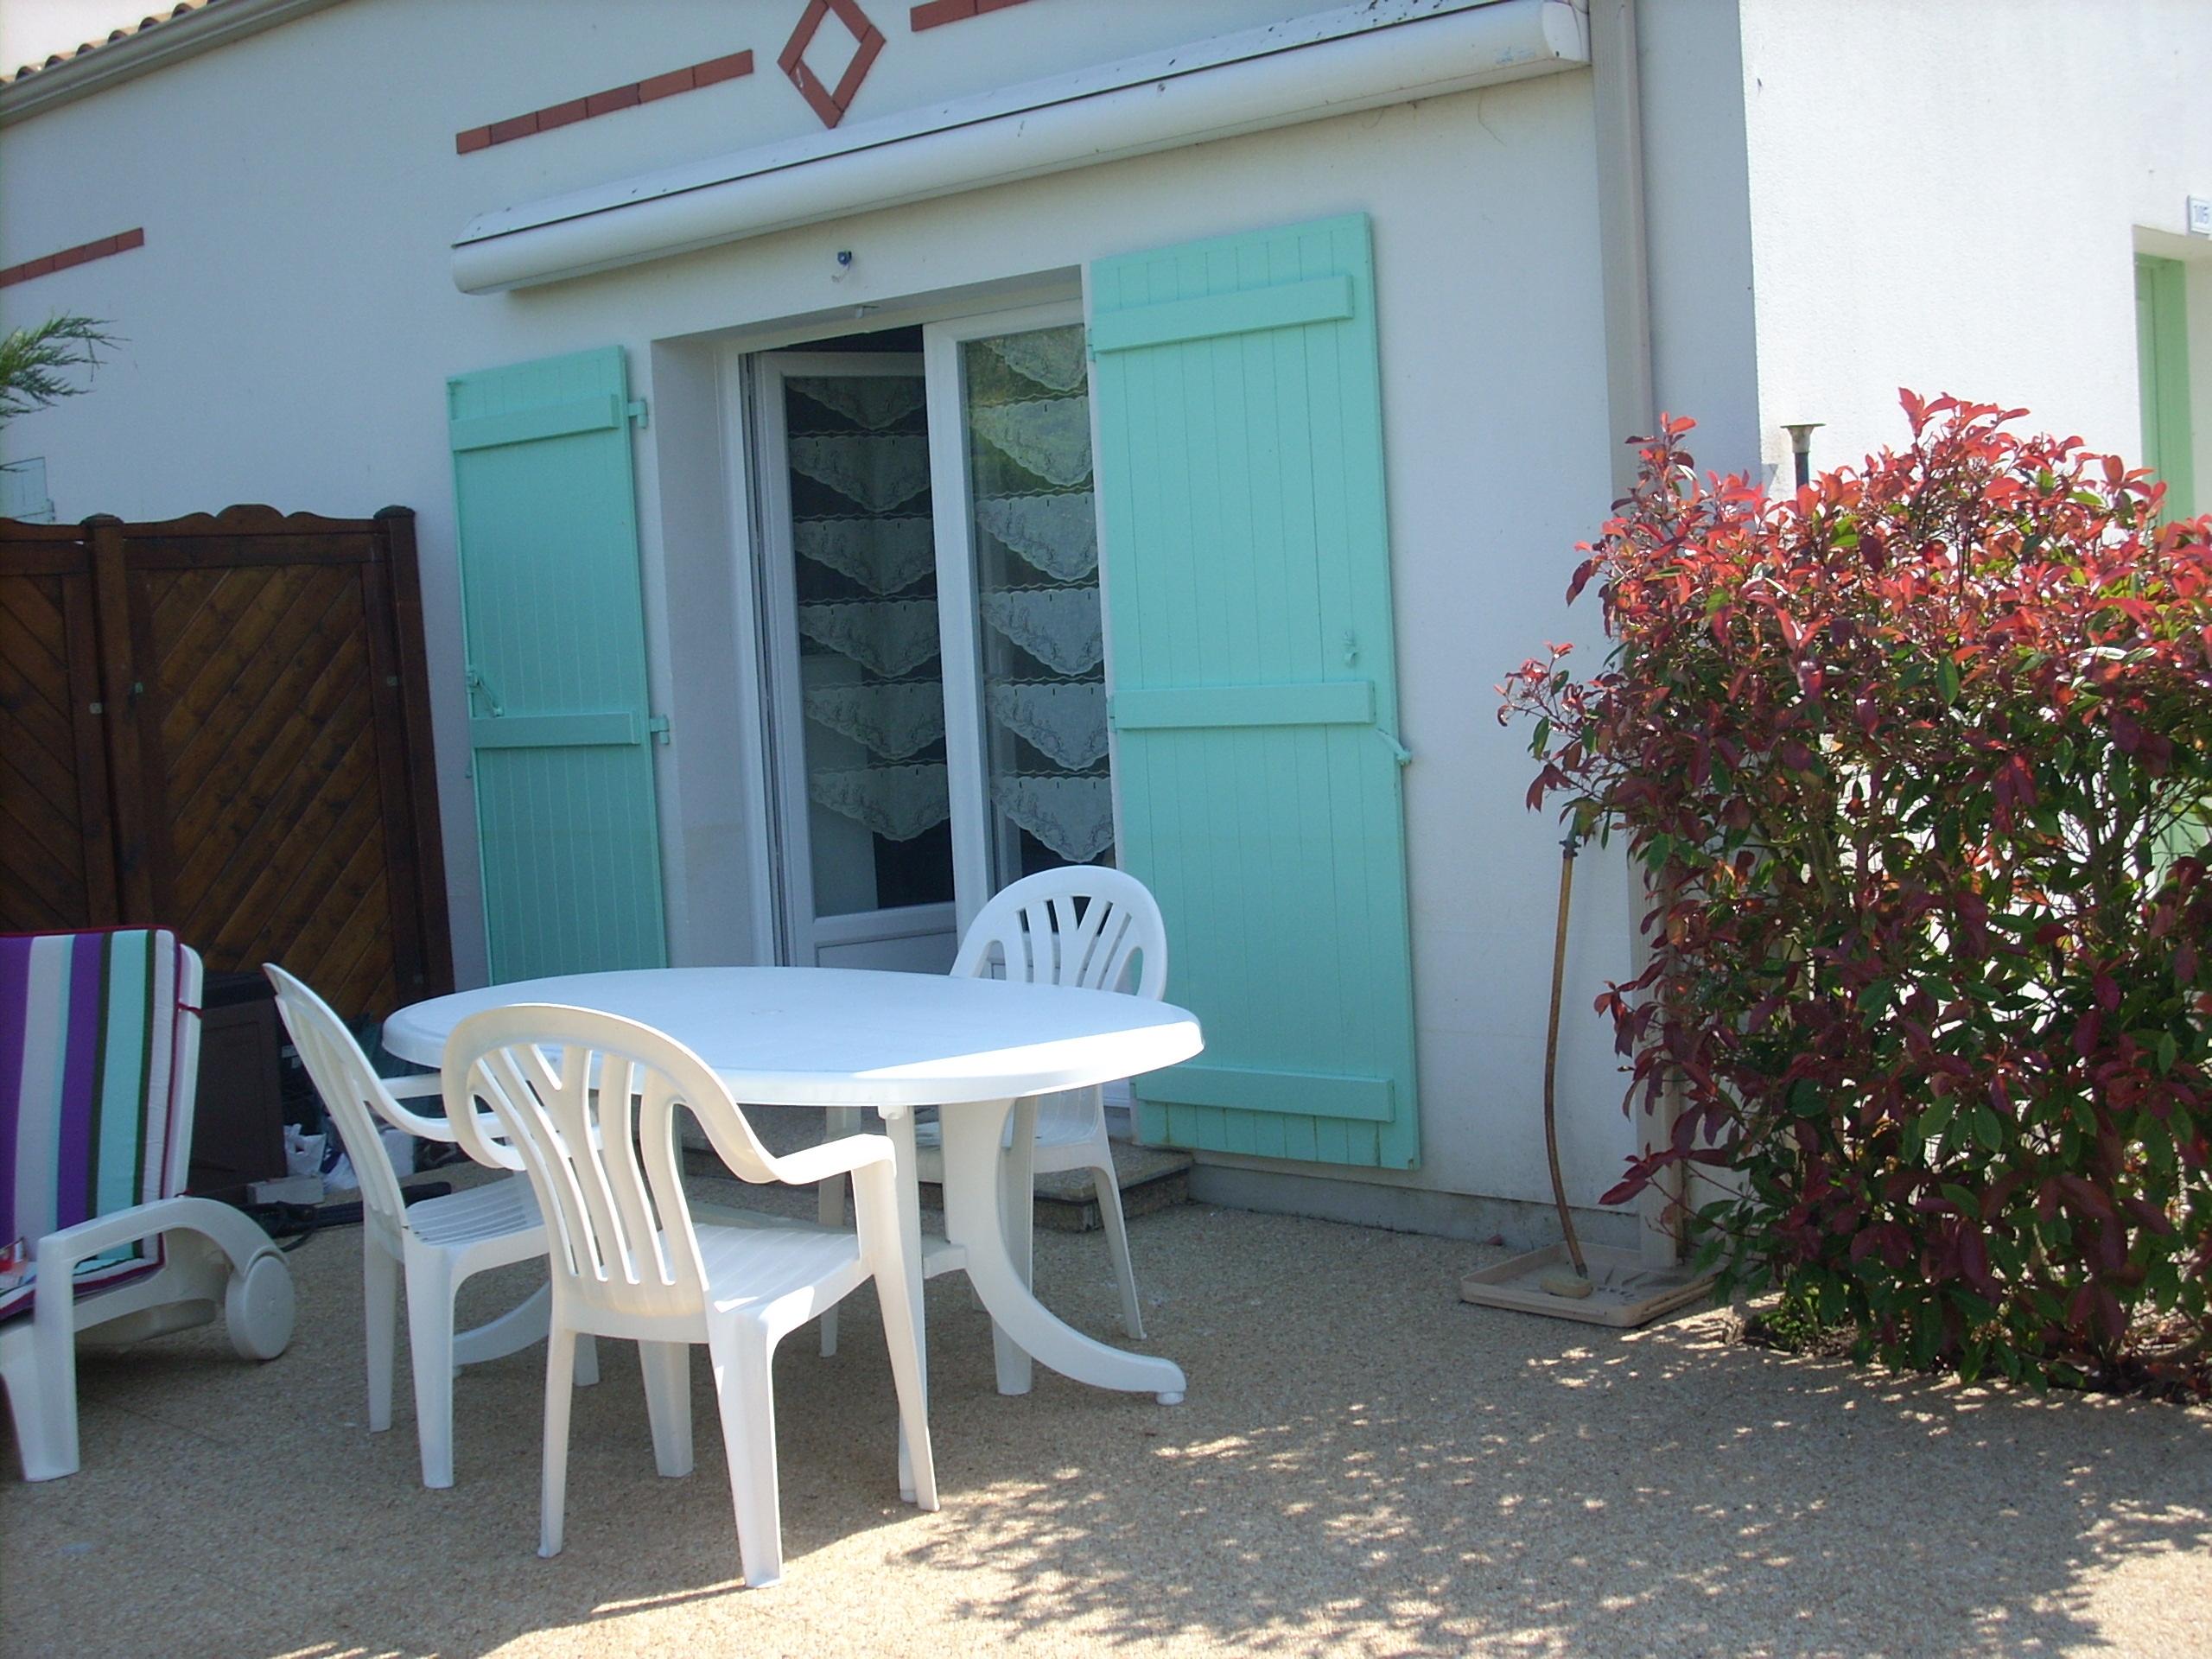 meuble-fonteneau-la-faute-sur-mer-85-hlo-1